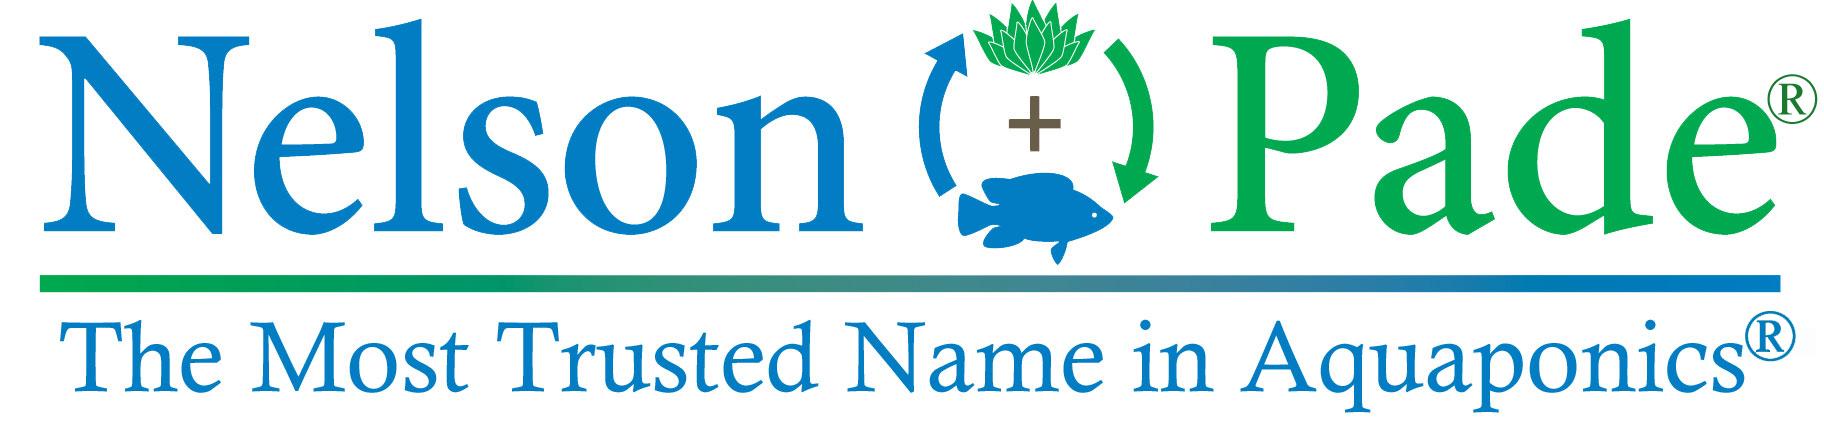 Aquaponics Project Planning - Commercial Aquaponics Business